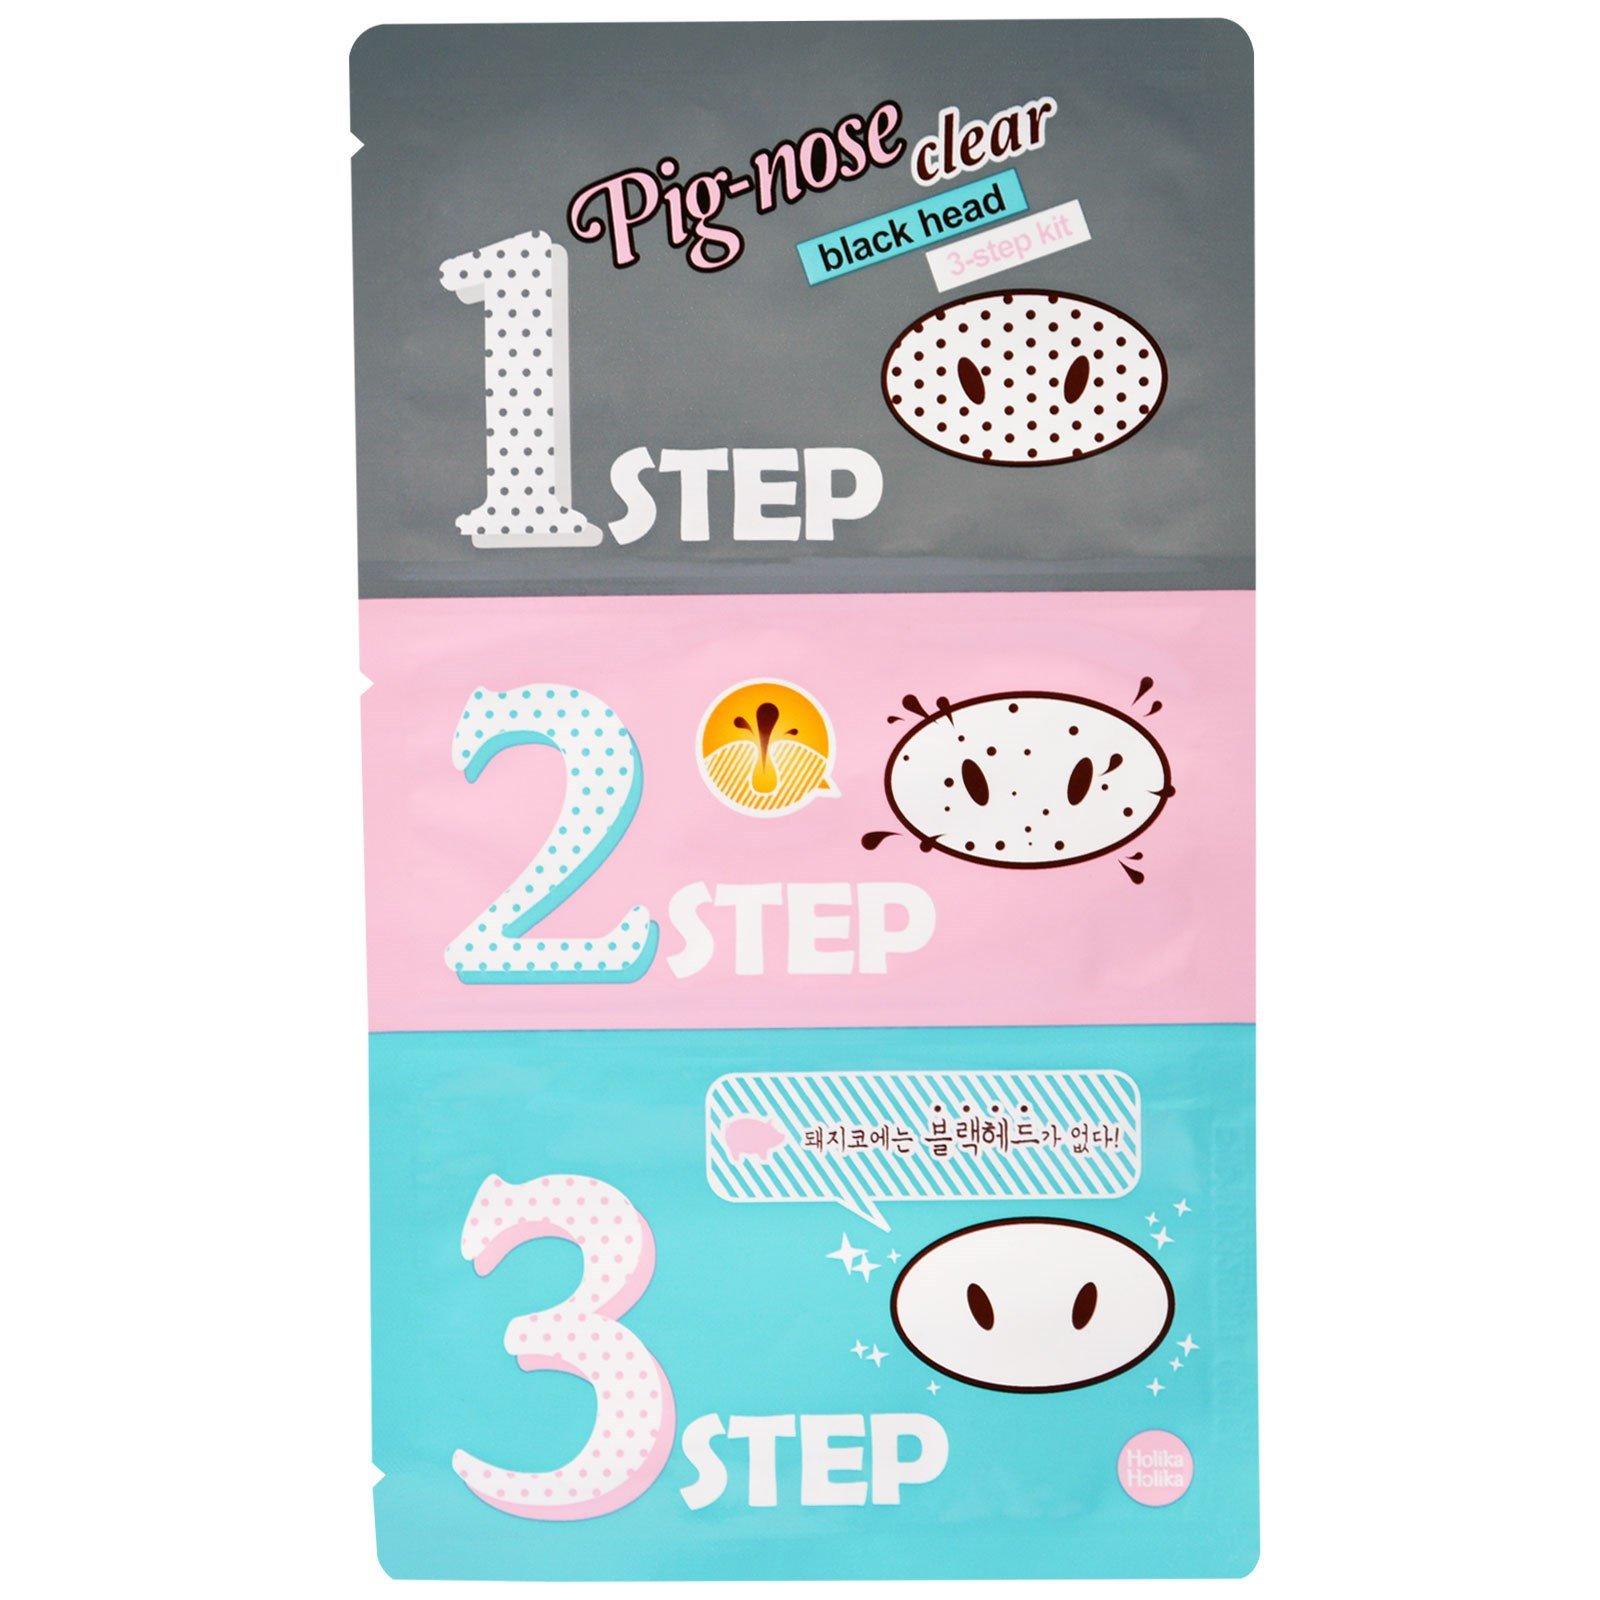 Holika Pig Nose Clear Blackhead 3 Step Kit 1 Treatment 5 Pure Essence Mask Sheet Shea Butter